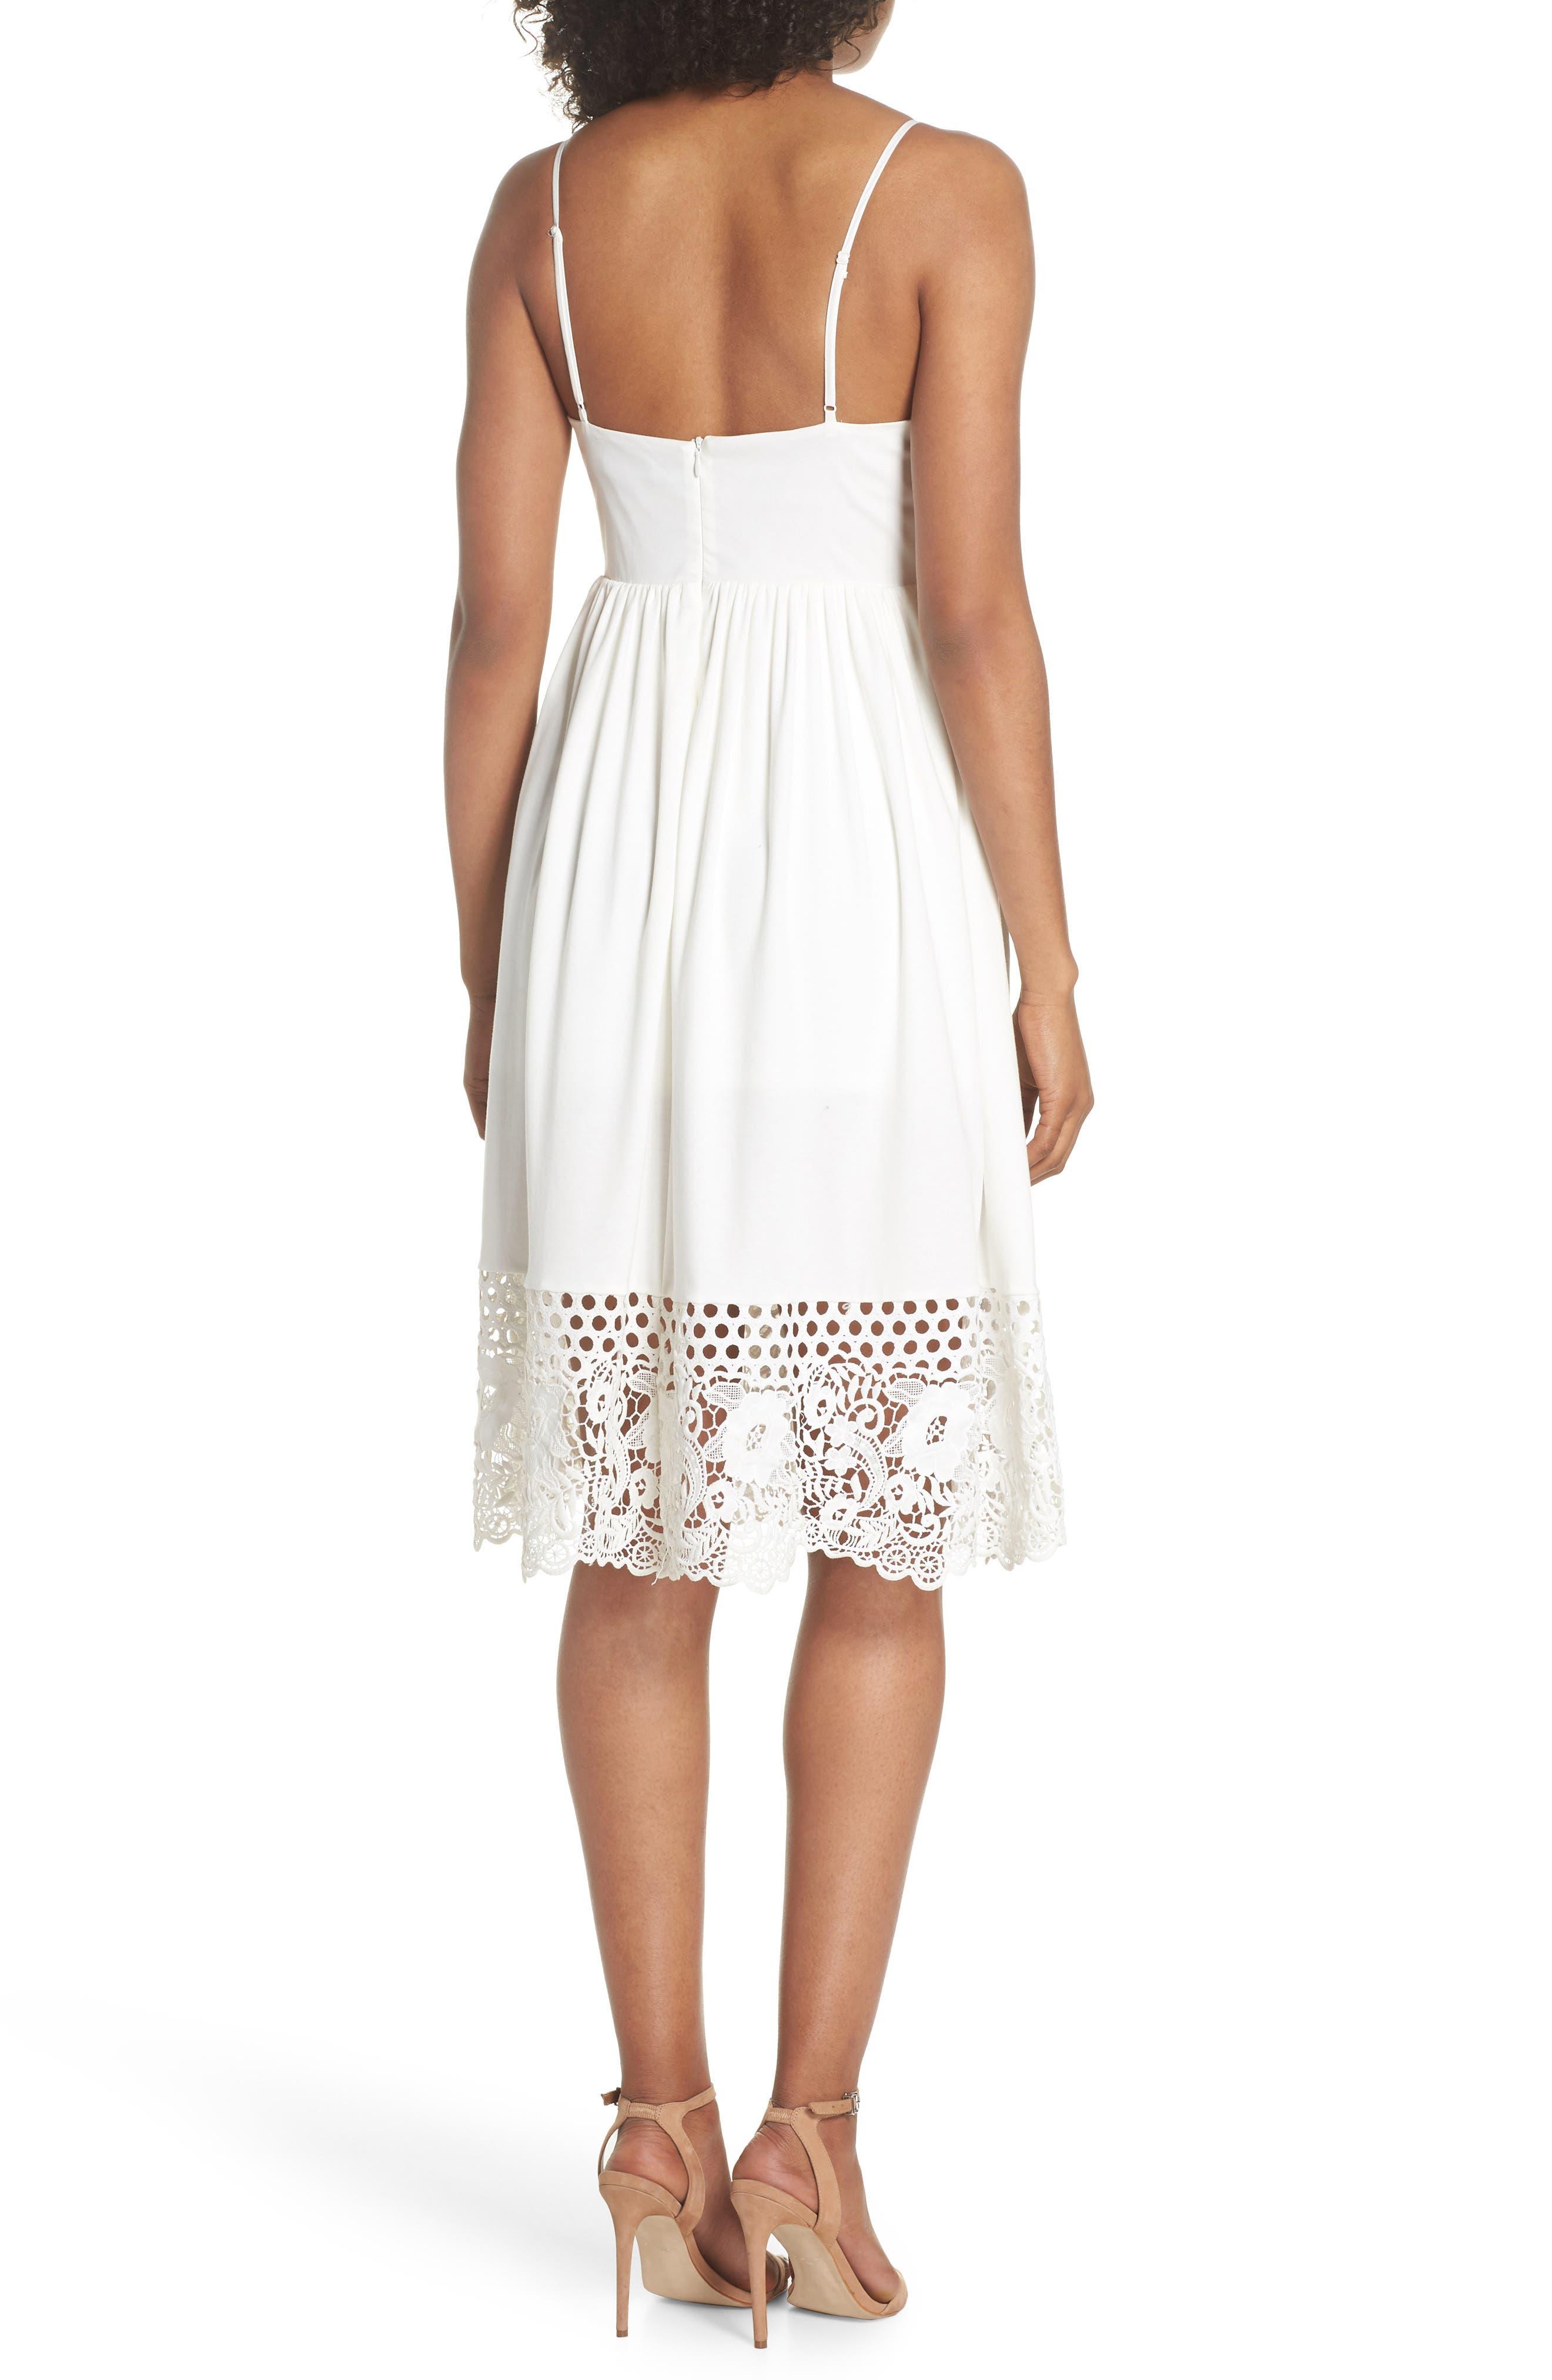 Salerno Lace Trim Jersey Dress,                             Alternate thumbnail 2, color,                             106